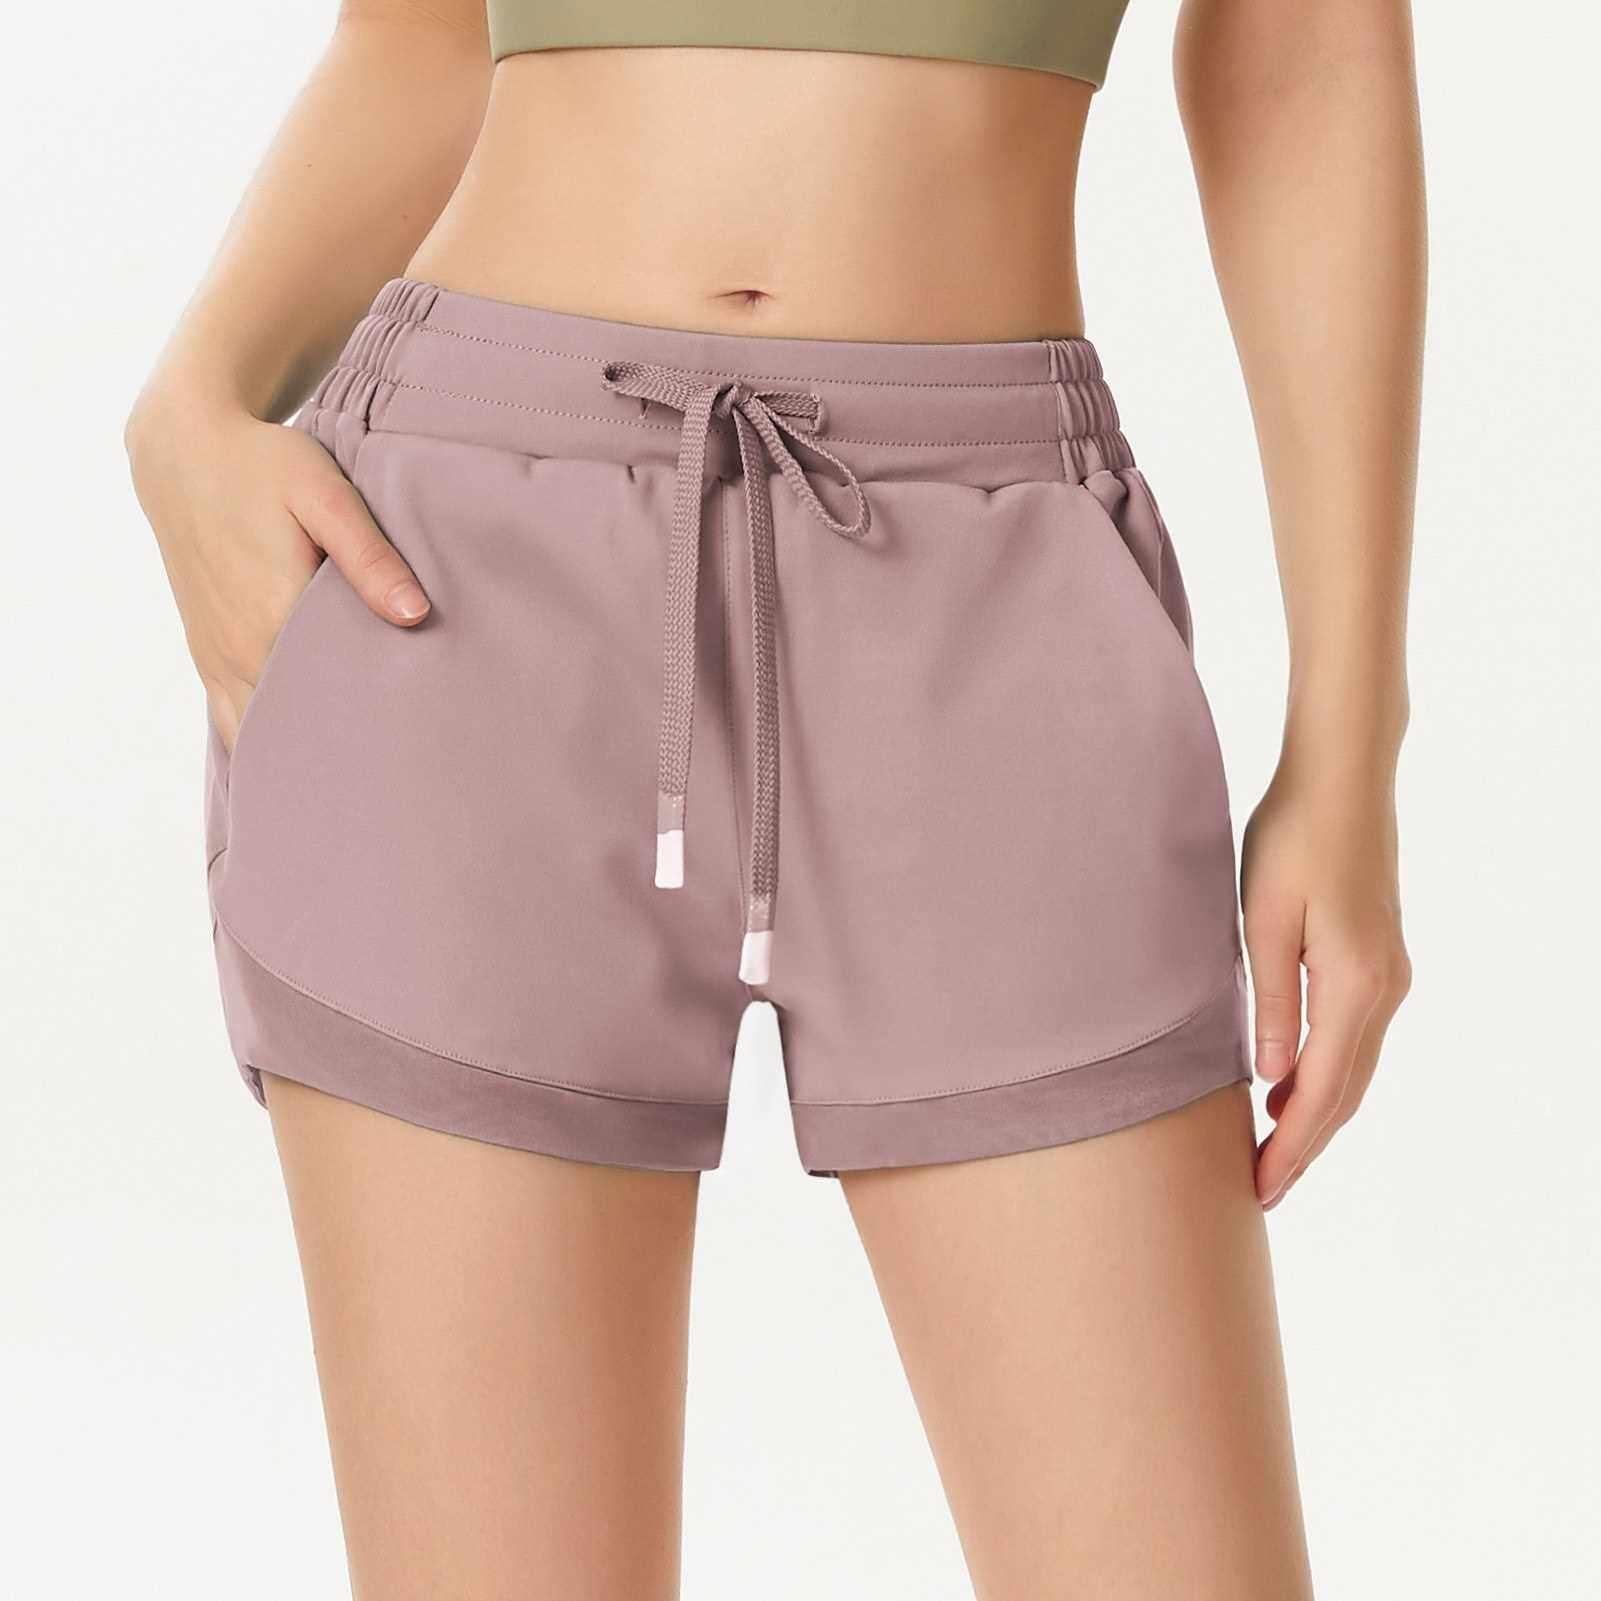 Women Sport Shorts Quick Dry with Mesh Elastic Waistband Pockets High Waist Fitness Gym Workout Yoga Short Pants (Light Purple)